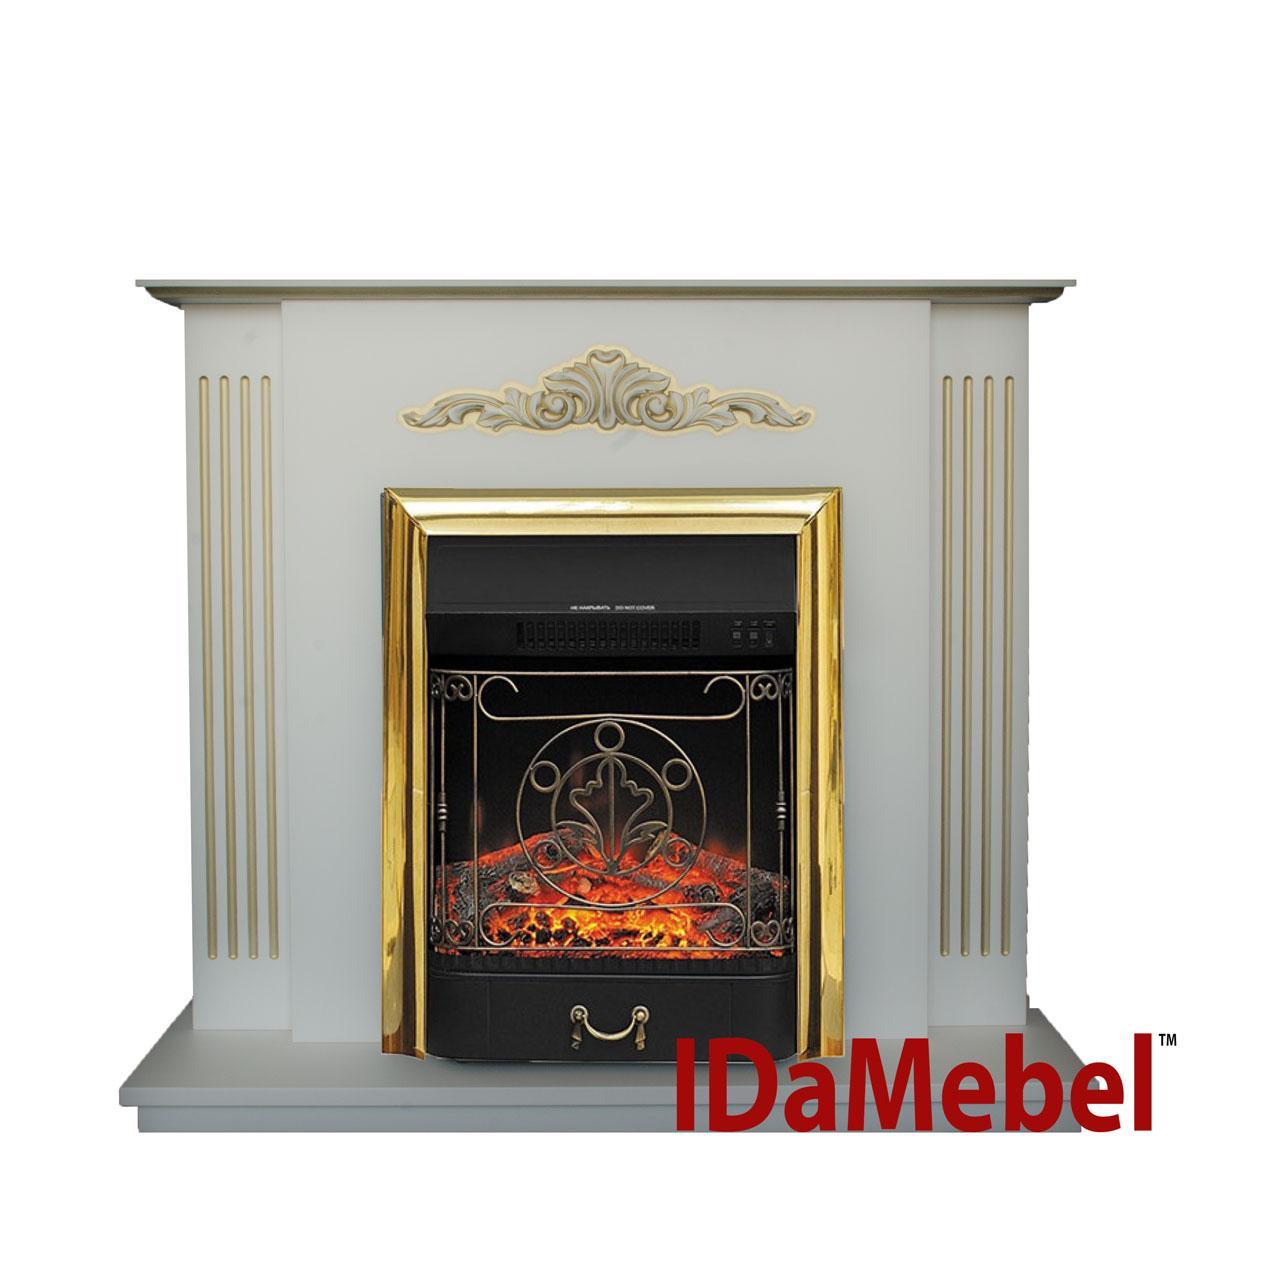 Електрокамін з порталом ROYAL FLAME IdaMebel Catarina Gold (каминокомплект)